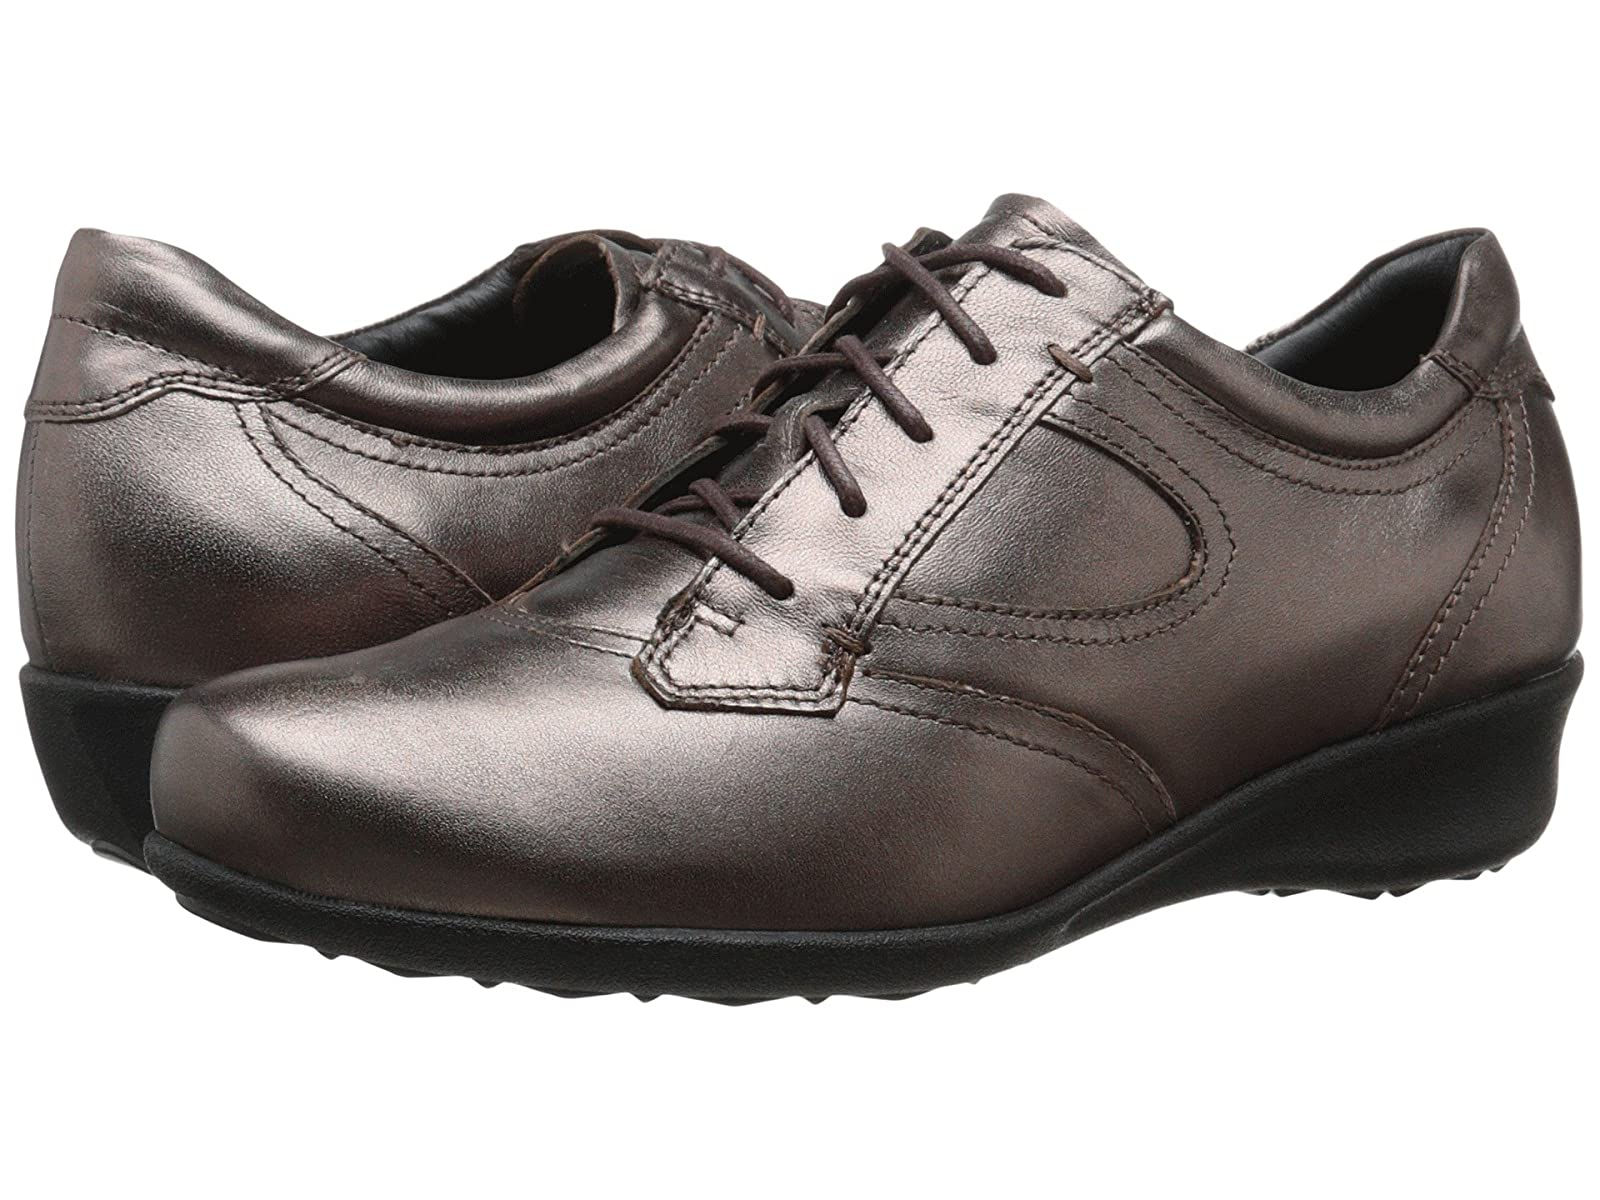 Drew PragueCheap and distinctive eye-catching shoes